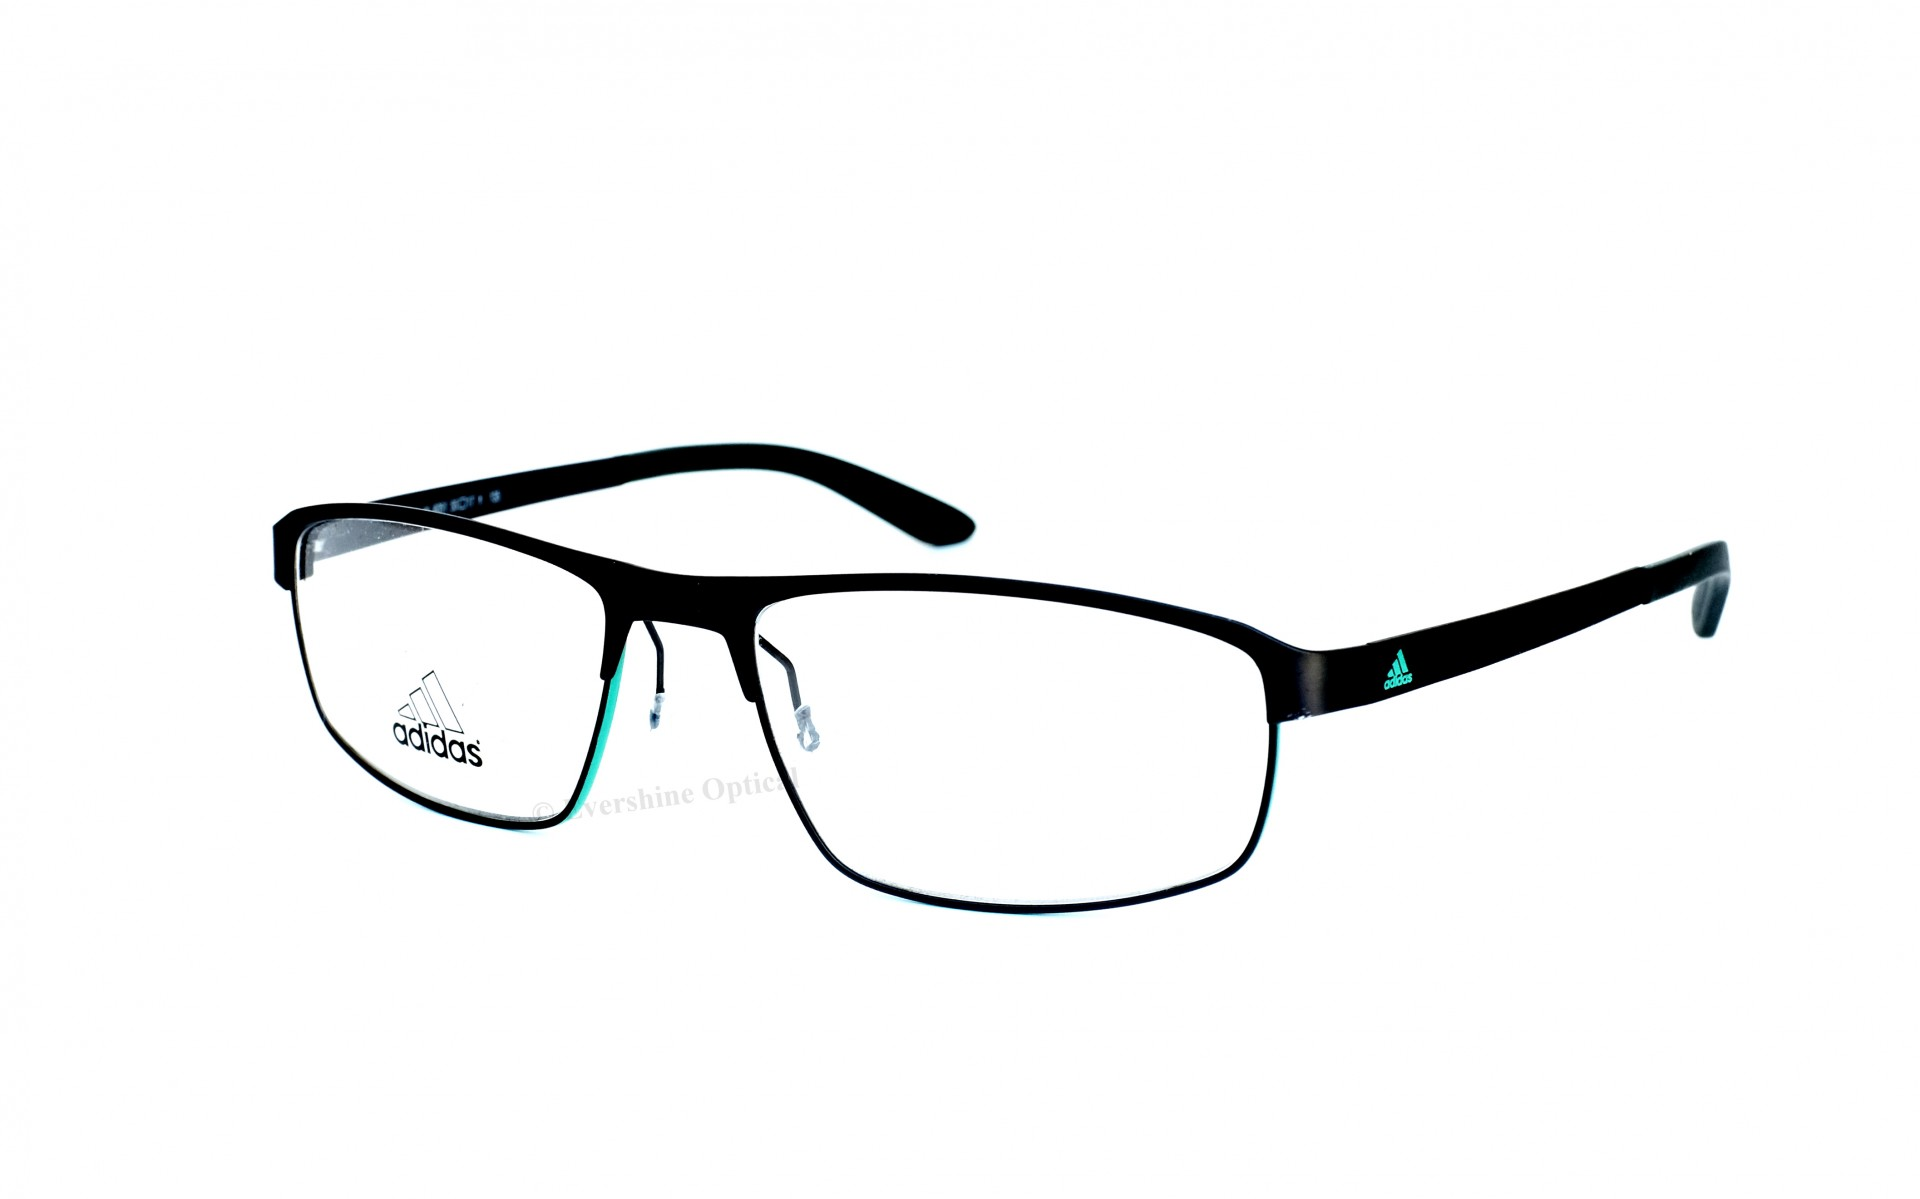 adidas glasses 2015